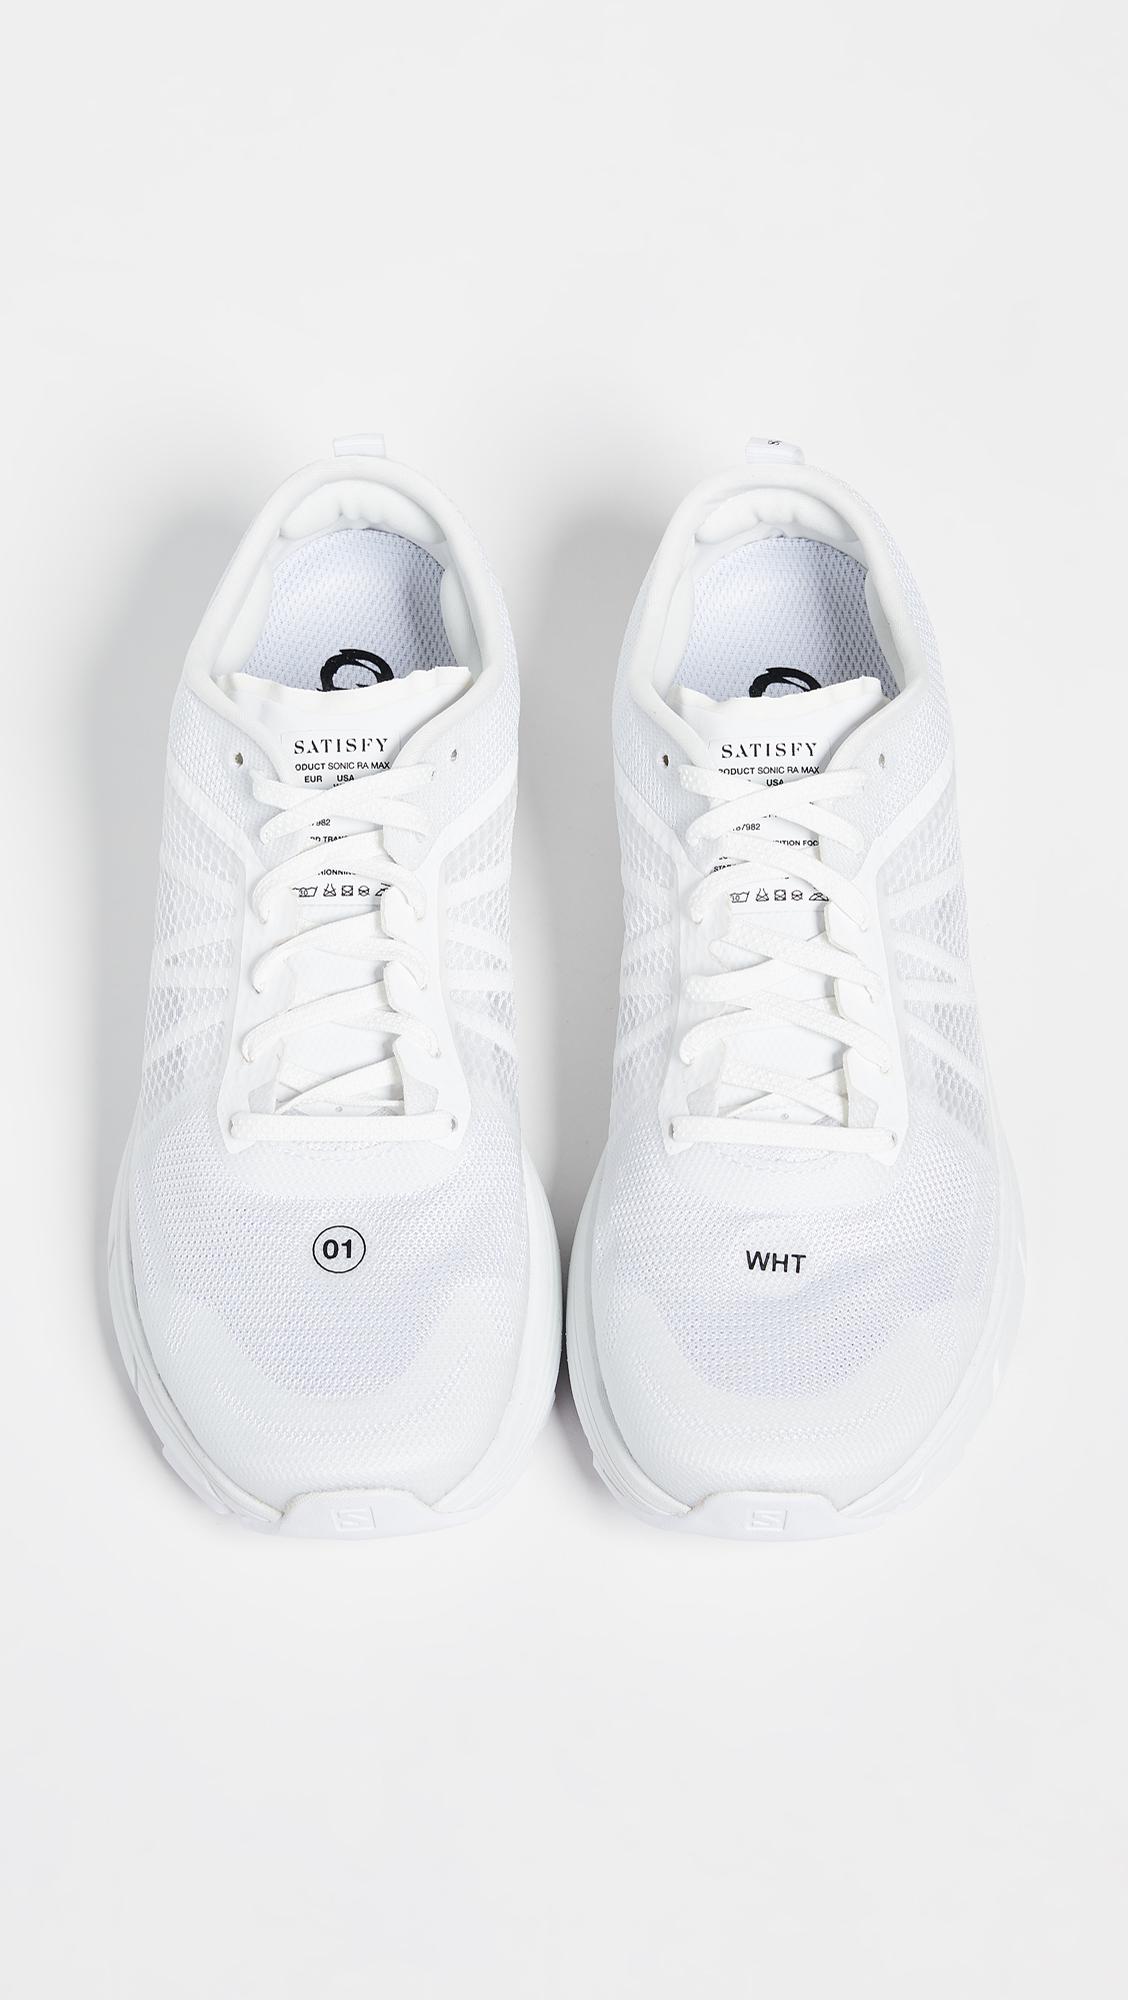 3aabf6b762716 Satisfy x Salomon Sonic Max Sneakers